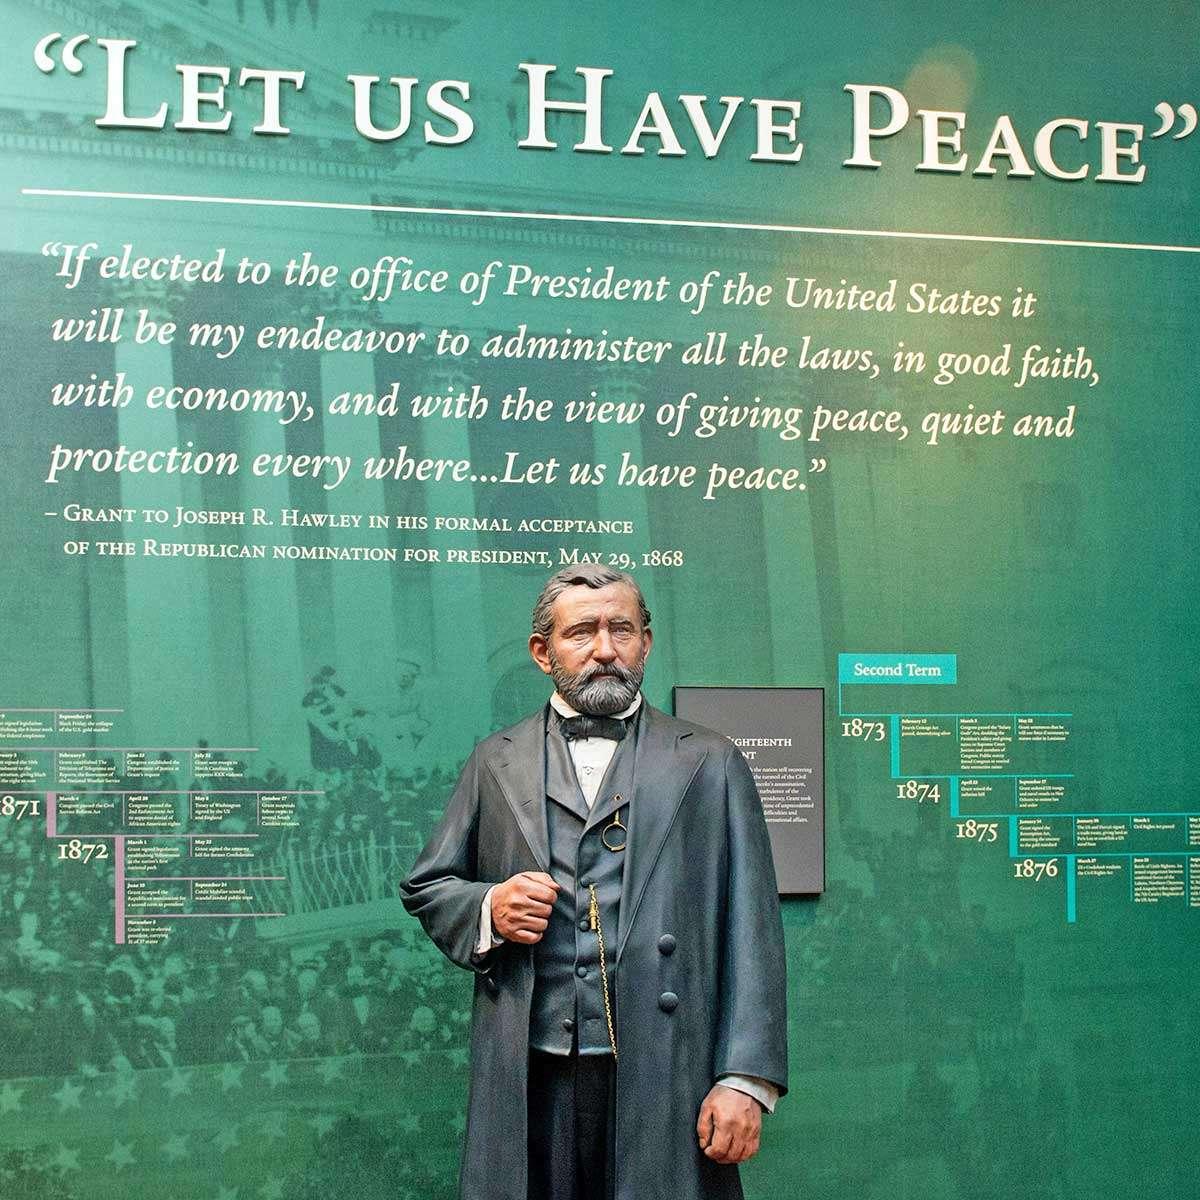 Ulysses S. Grant Presidential Library Museum  at Mississippi State University, Starkville, MS